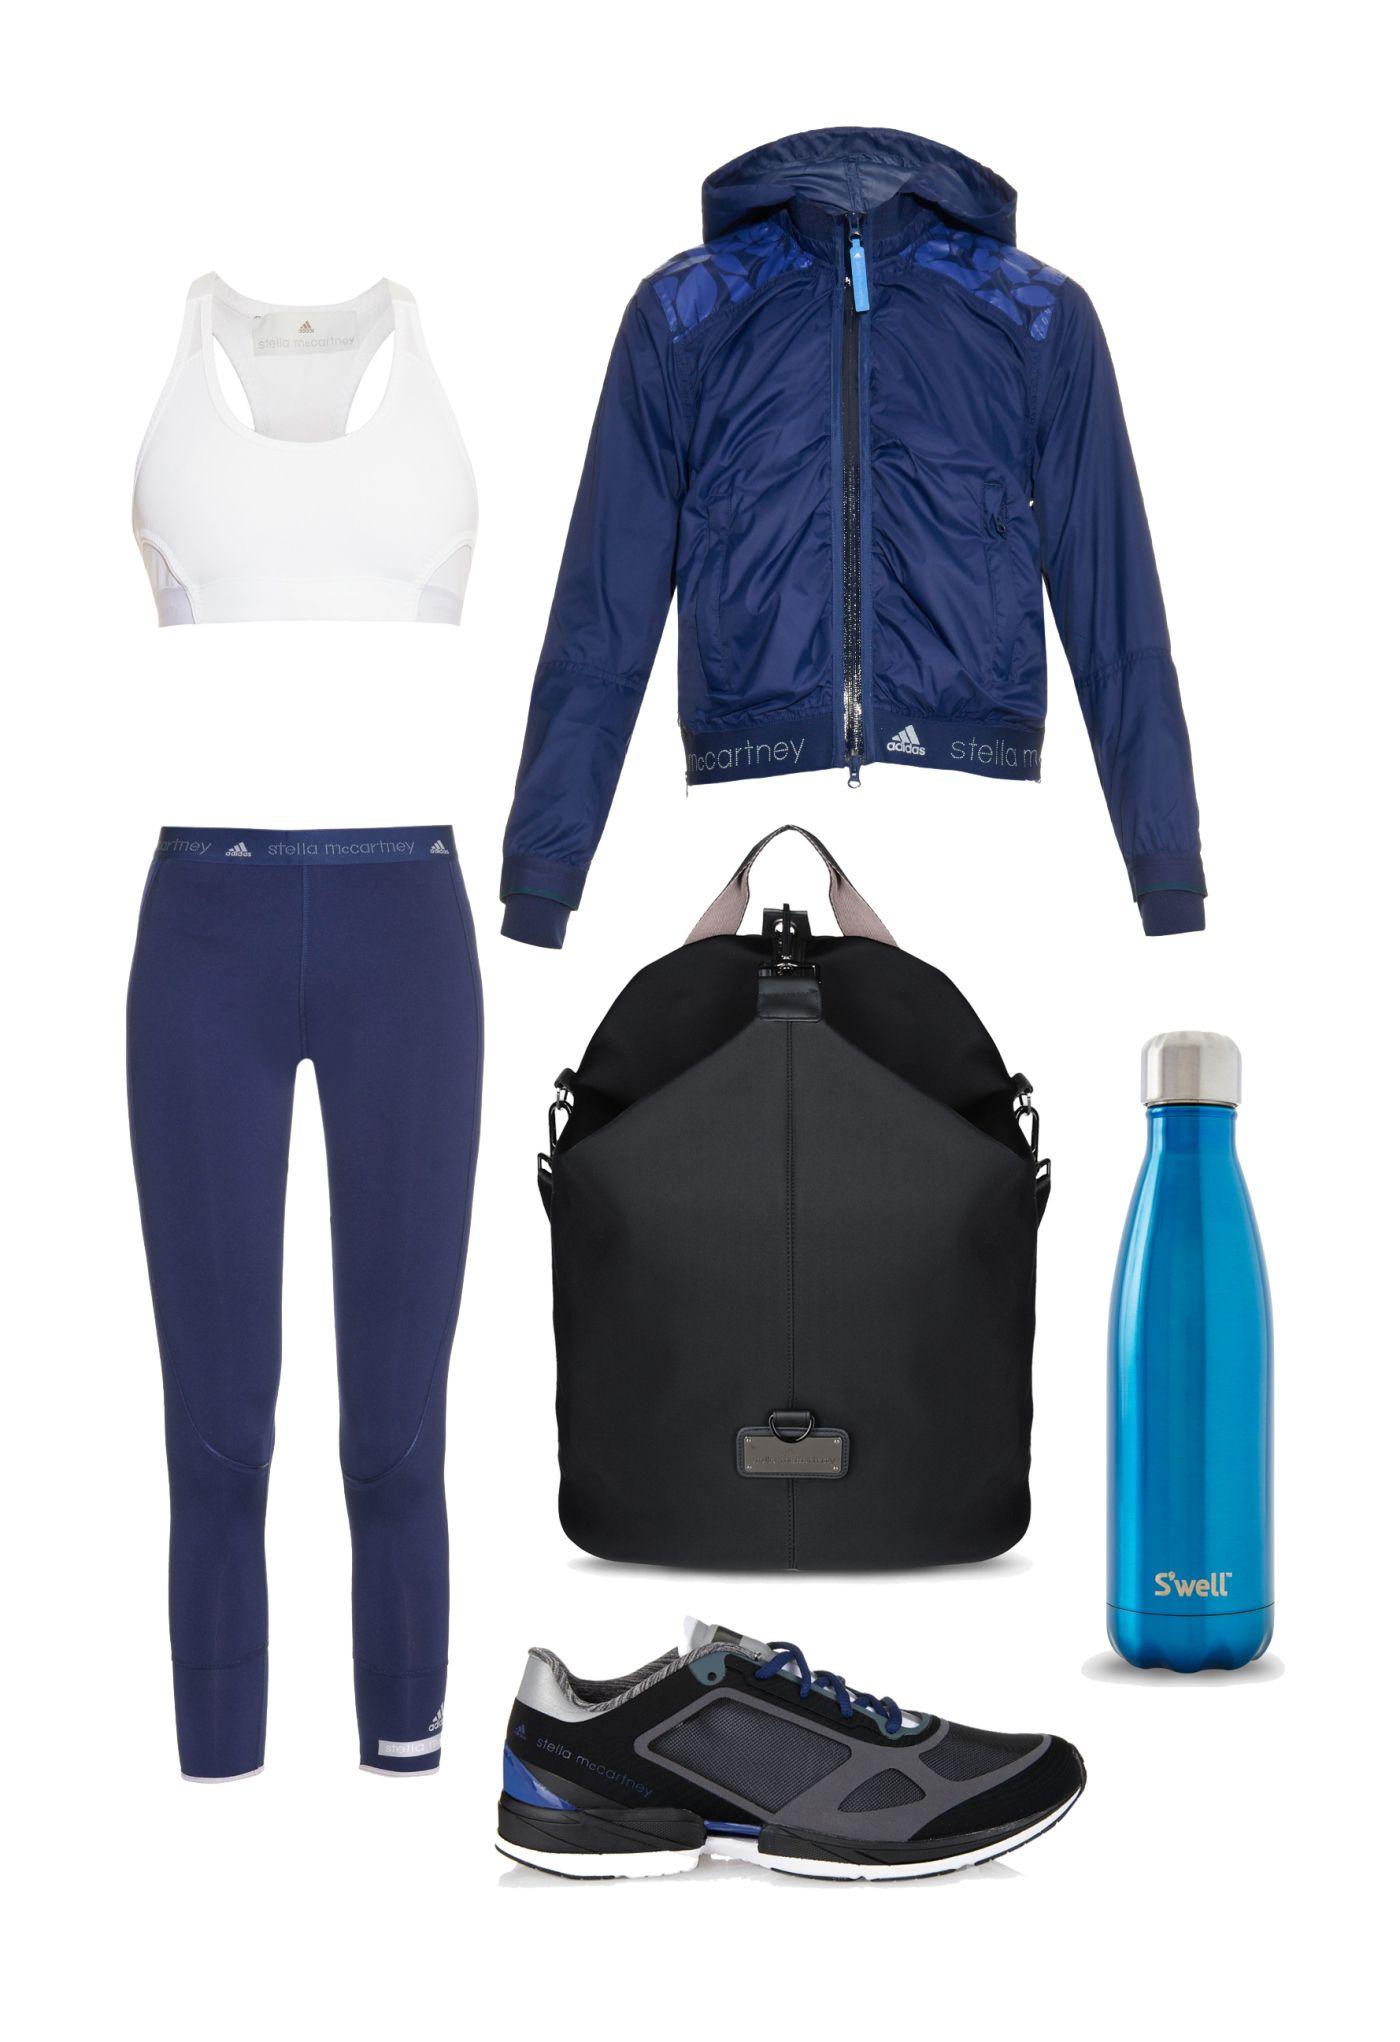 Sportswear chic | lahummatbayli